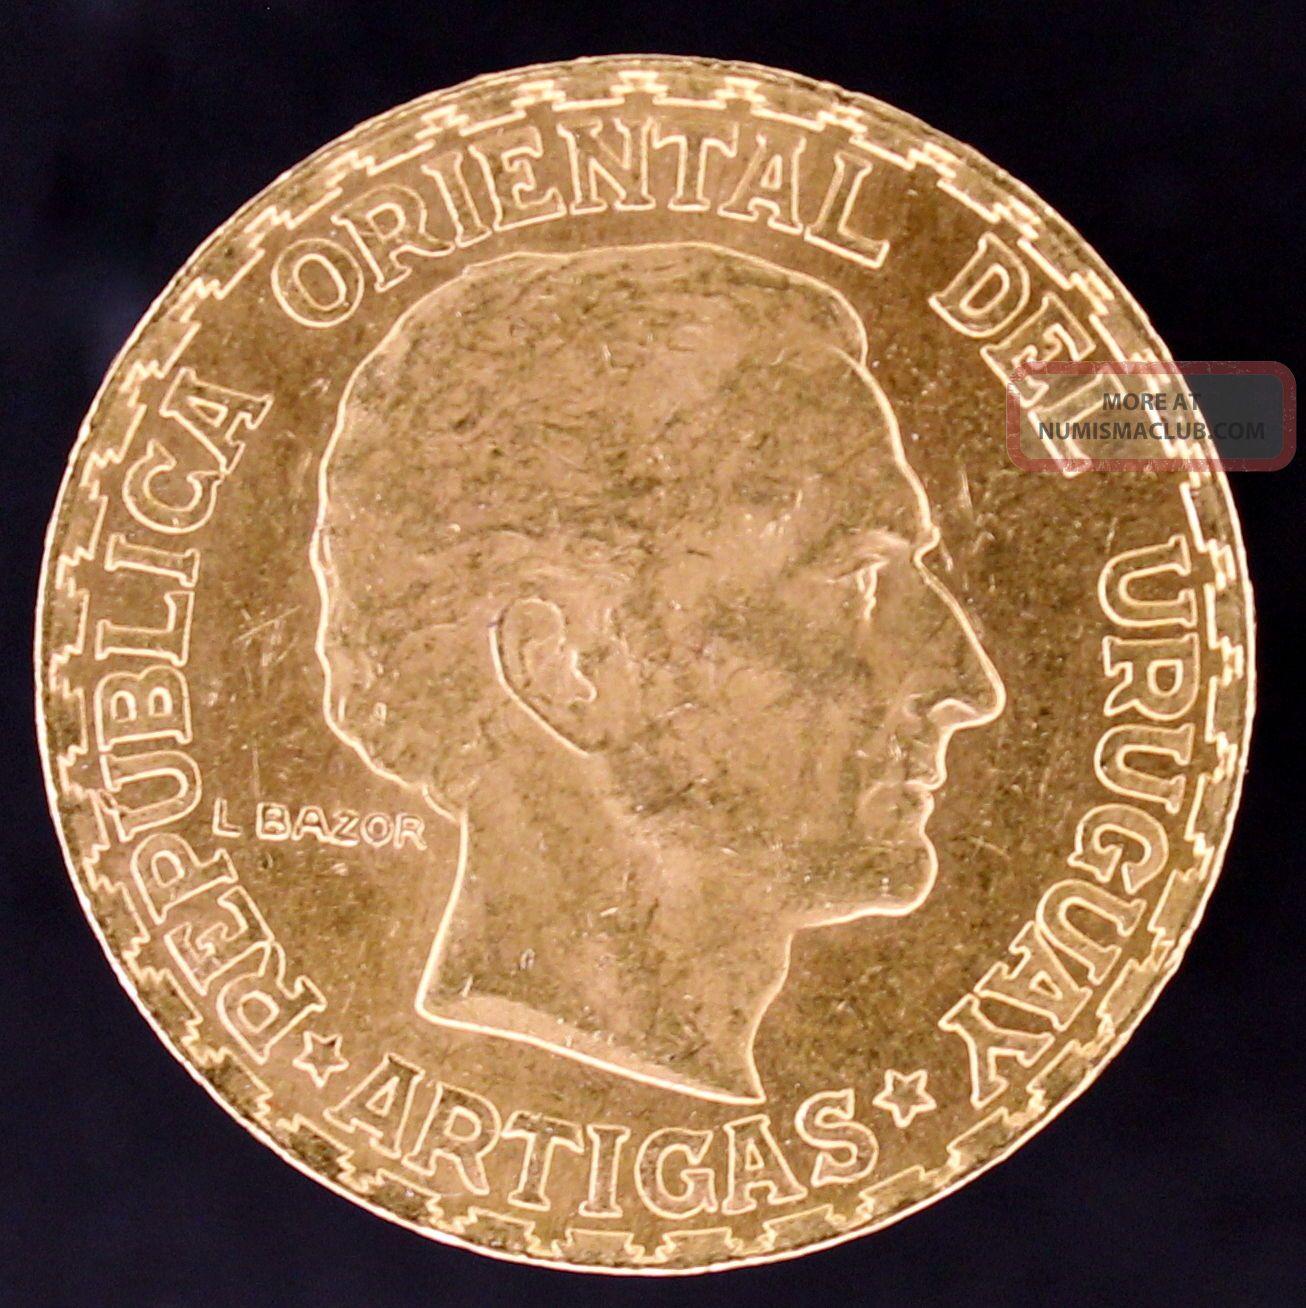 1930 Uruguay 5 Peso Gold Coin.  2501 Troy Oz Actual Gold Weight Agw - Artigas South America photo